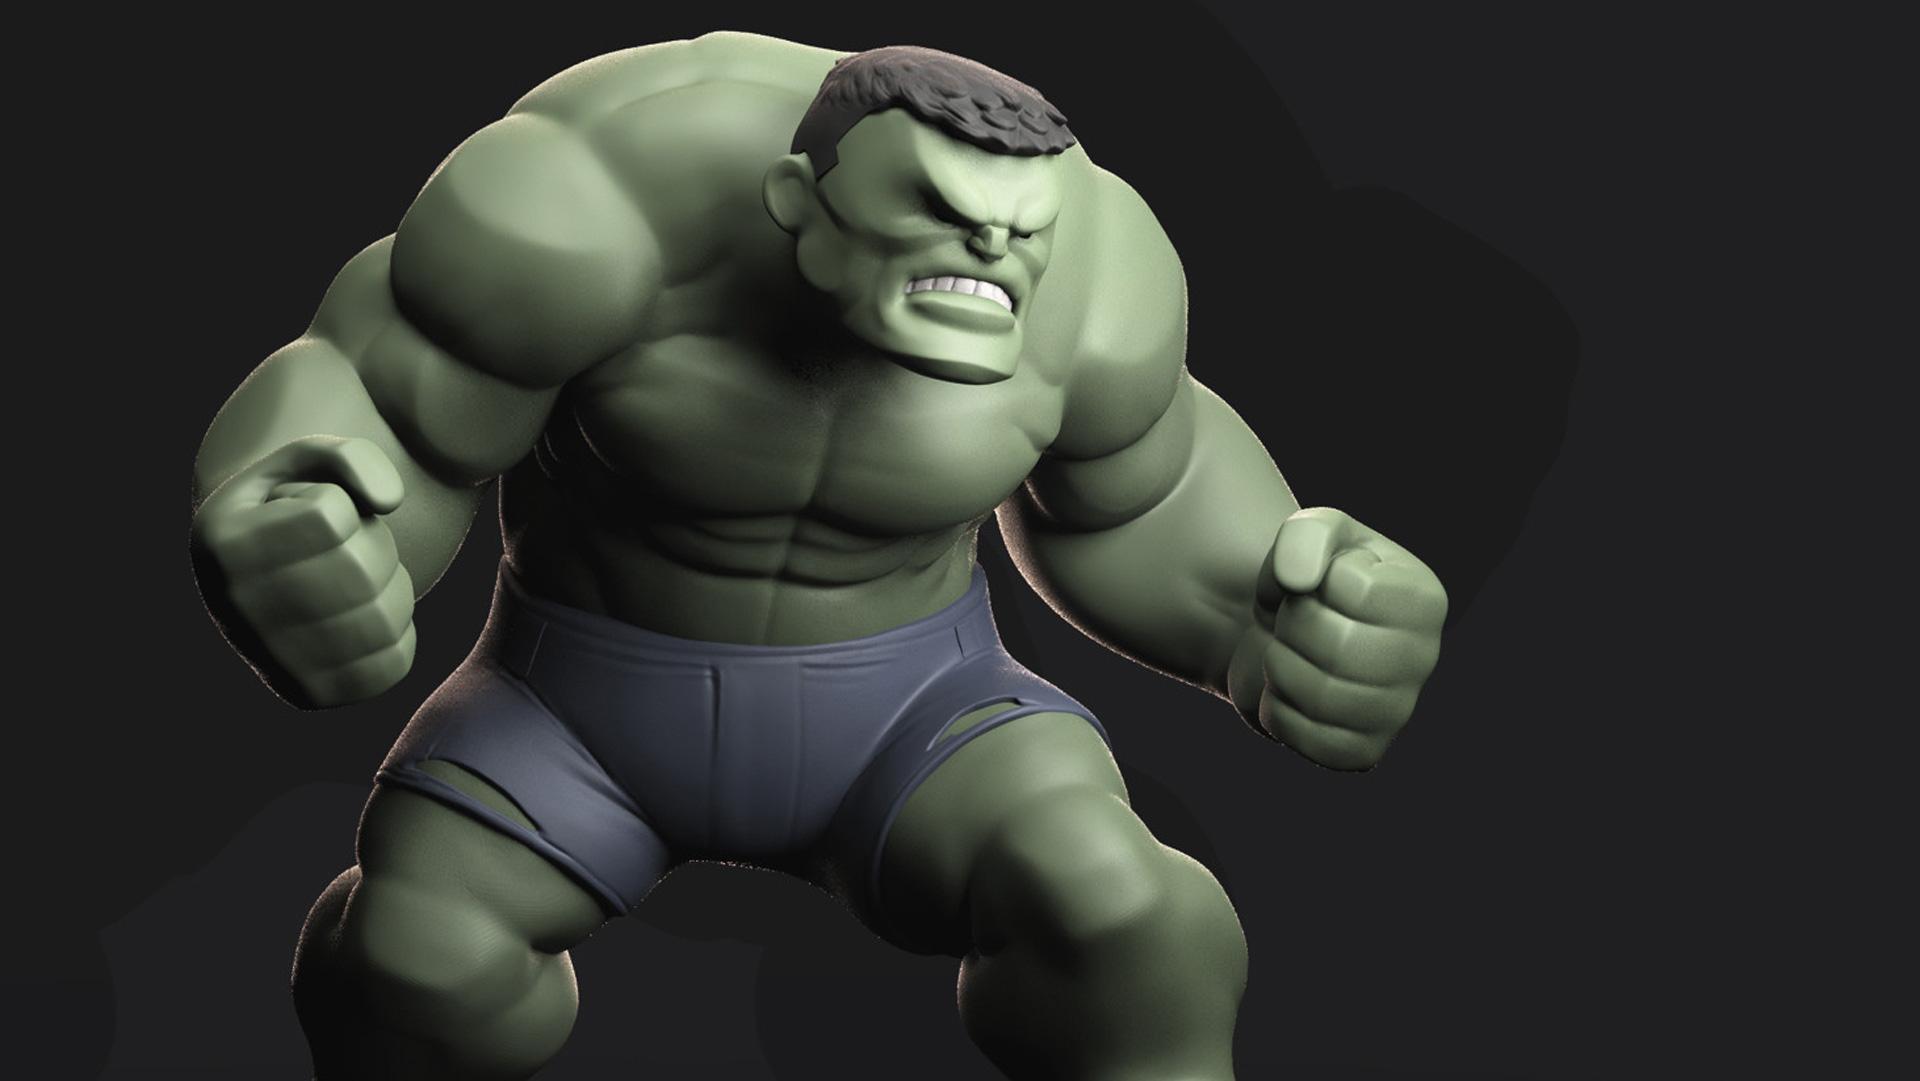 Hulk 3d Avengers Infinity War Hd Superheroes 4k Wallpapers